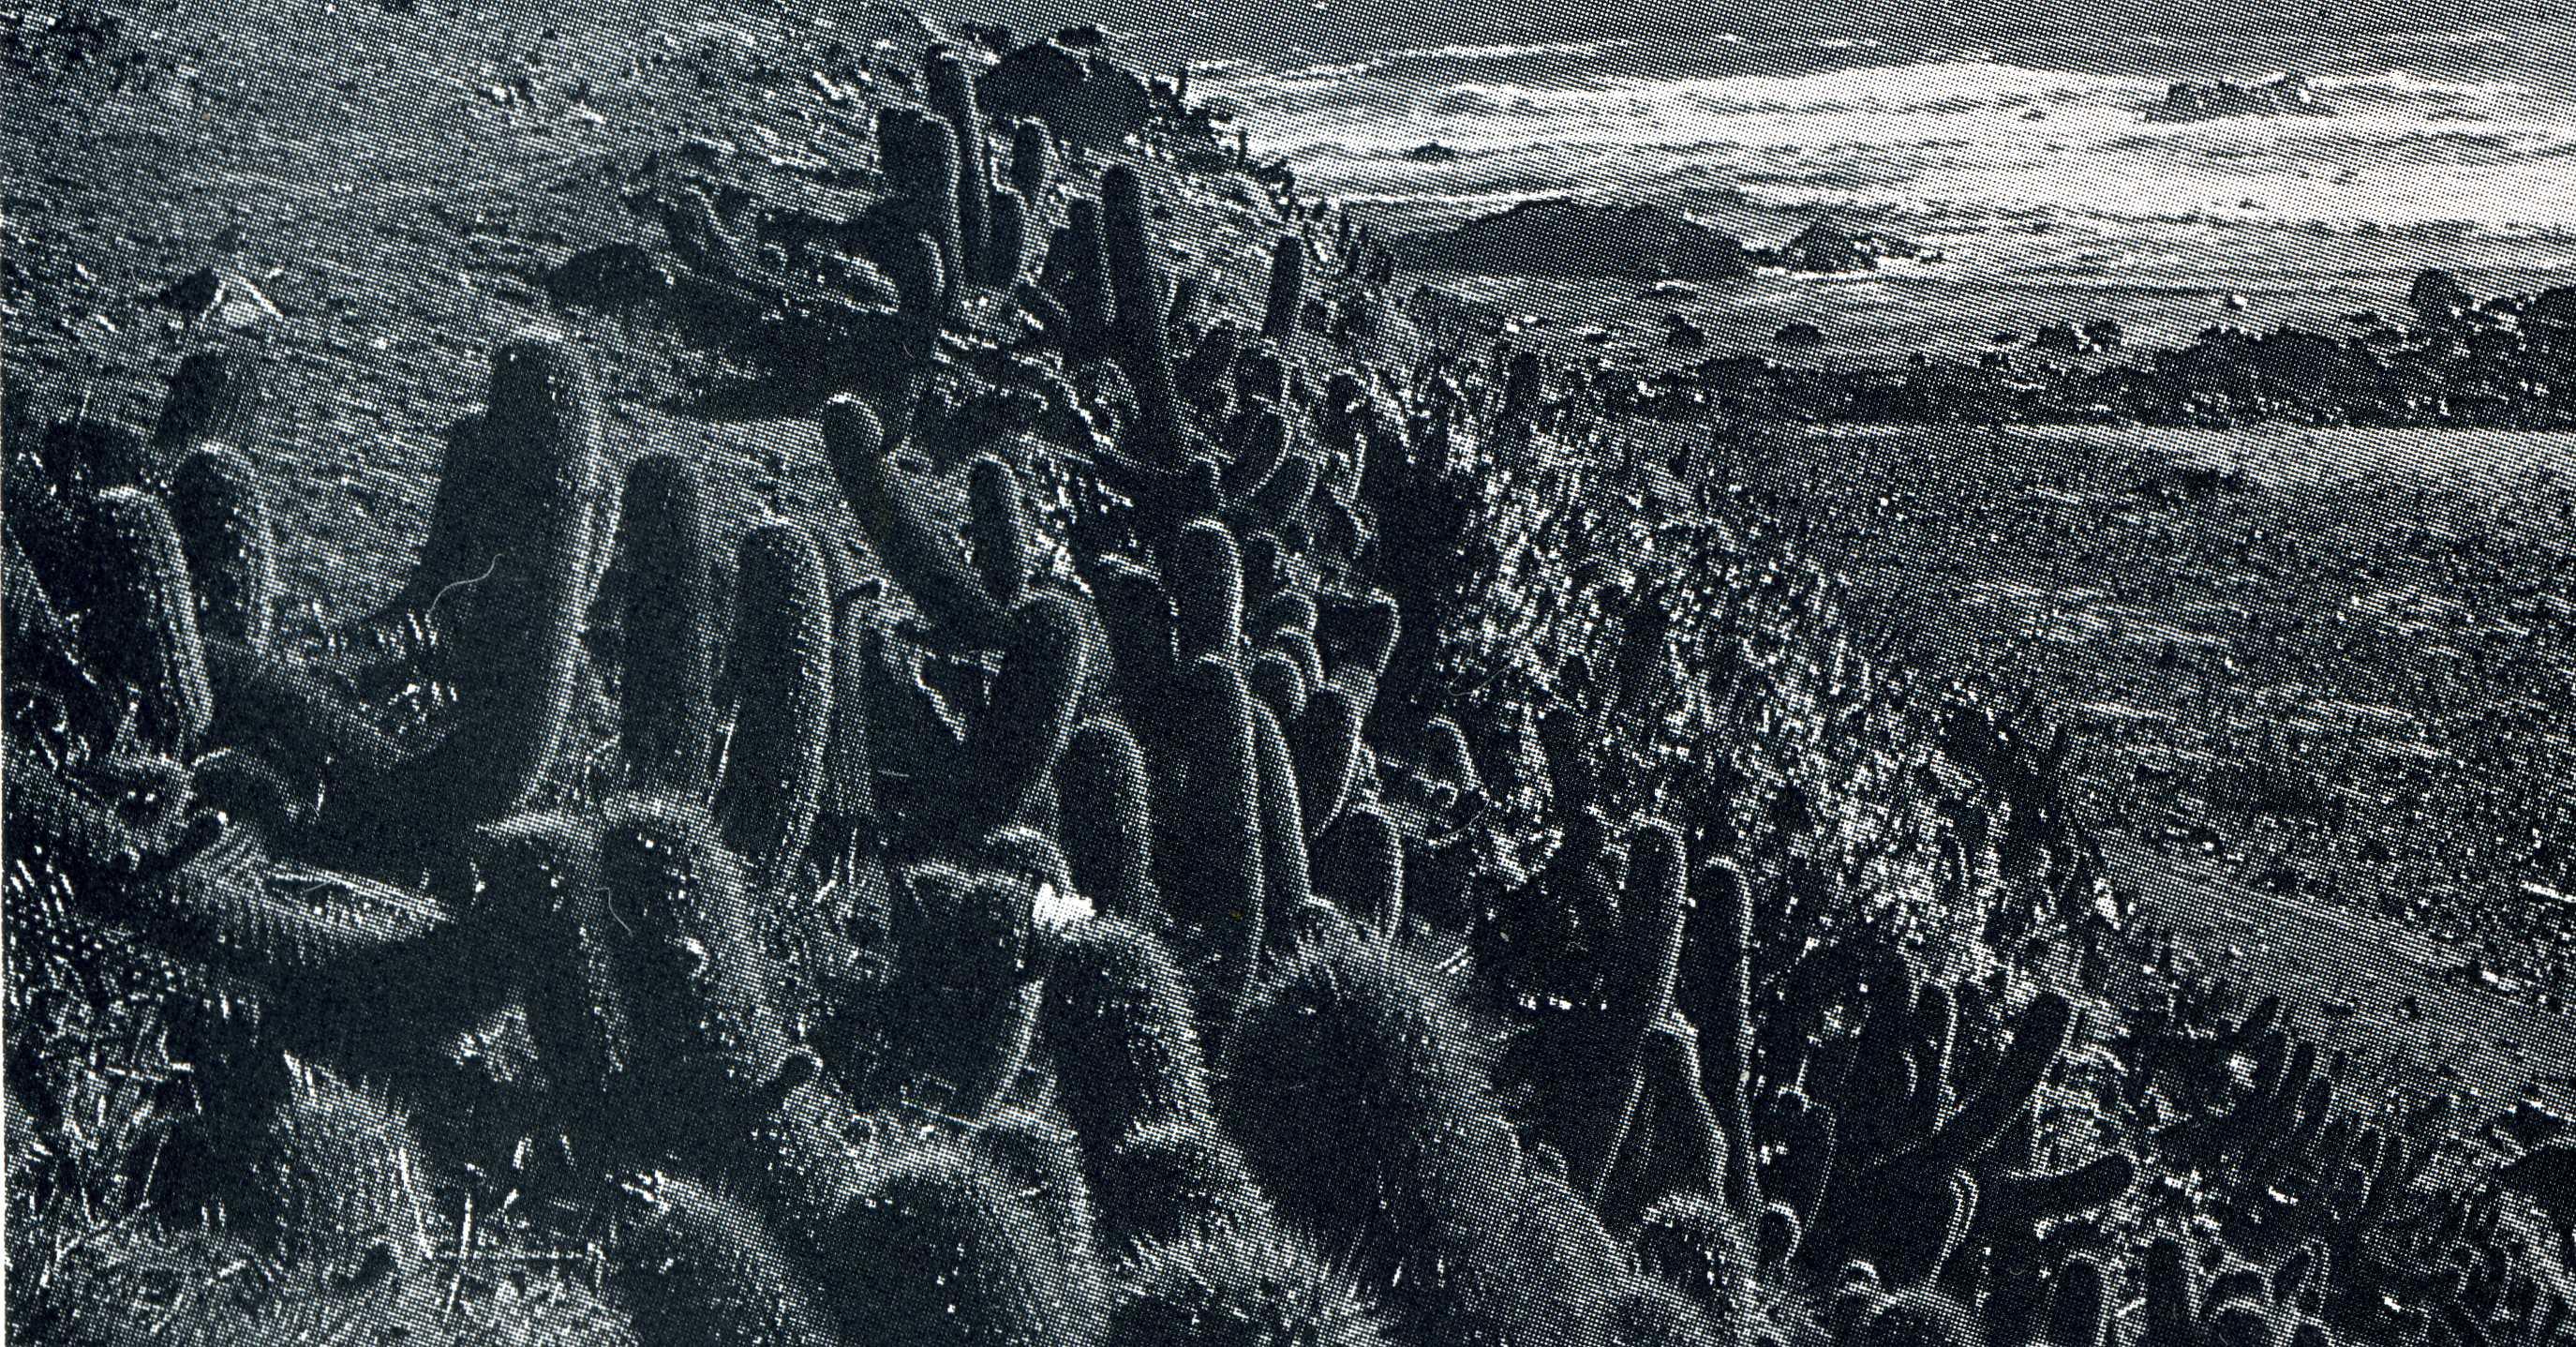 Trichocereus litoralis Echinopsis chiloensis ssp. litoralis 8